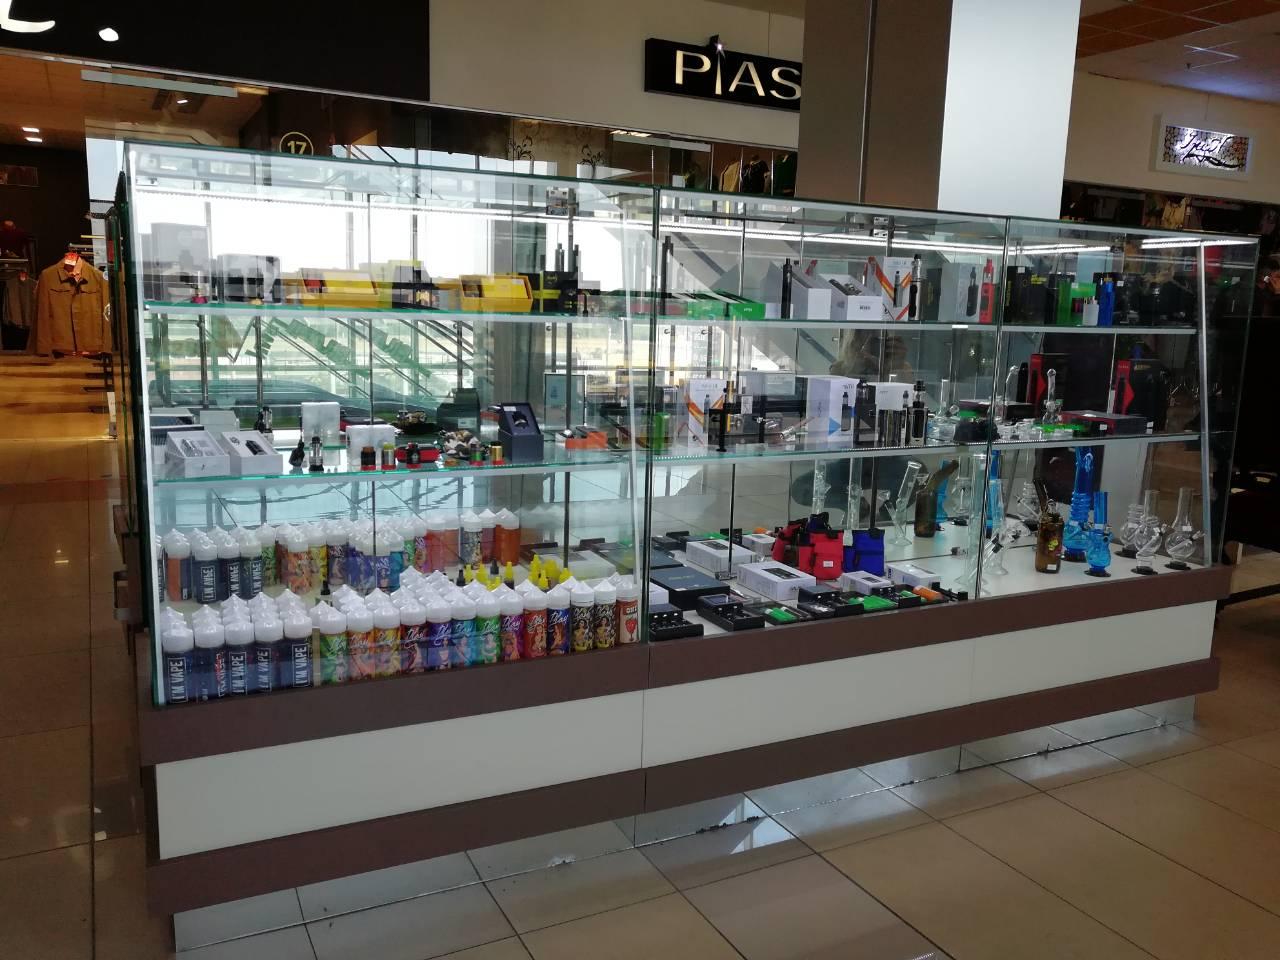 shops_vape-shop_img_IMG-09d224d90b971fd66400b945d4c2127a-V